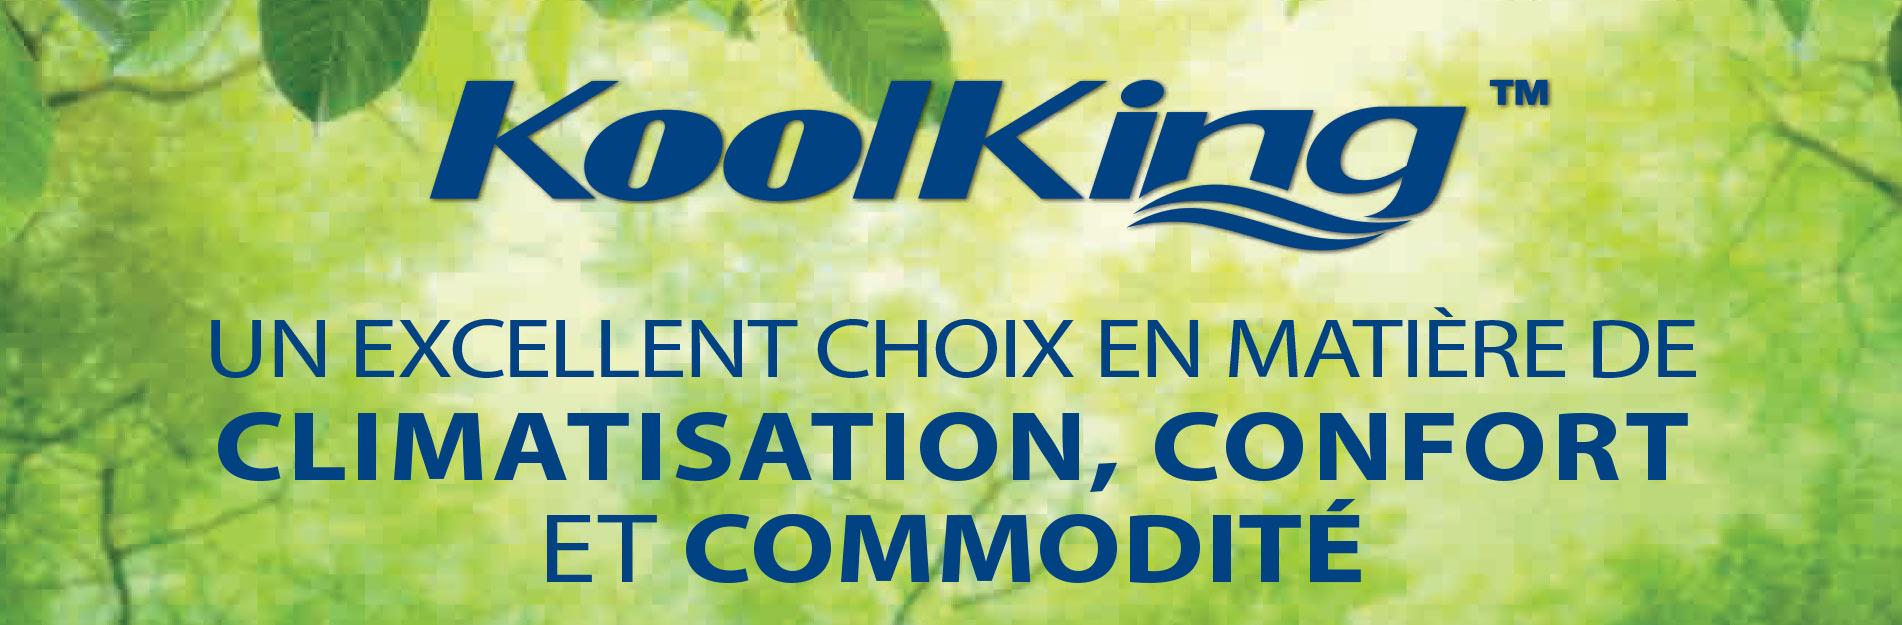 koolking climatisation confort commodité